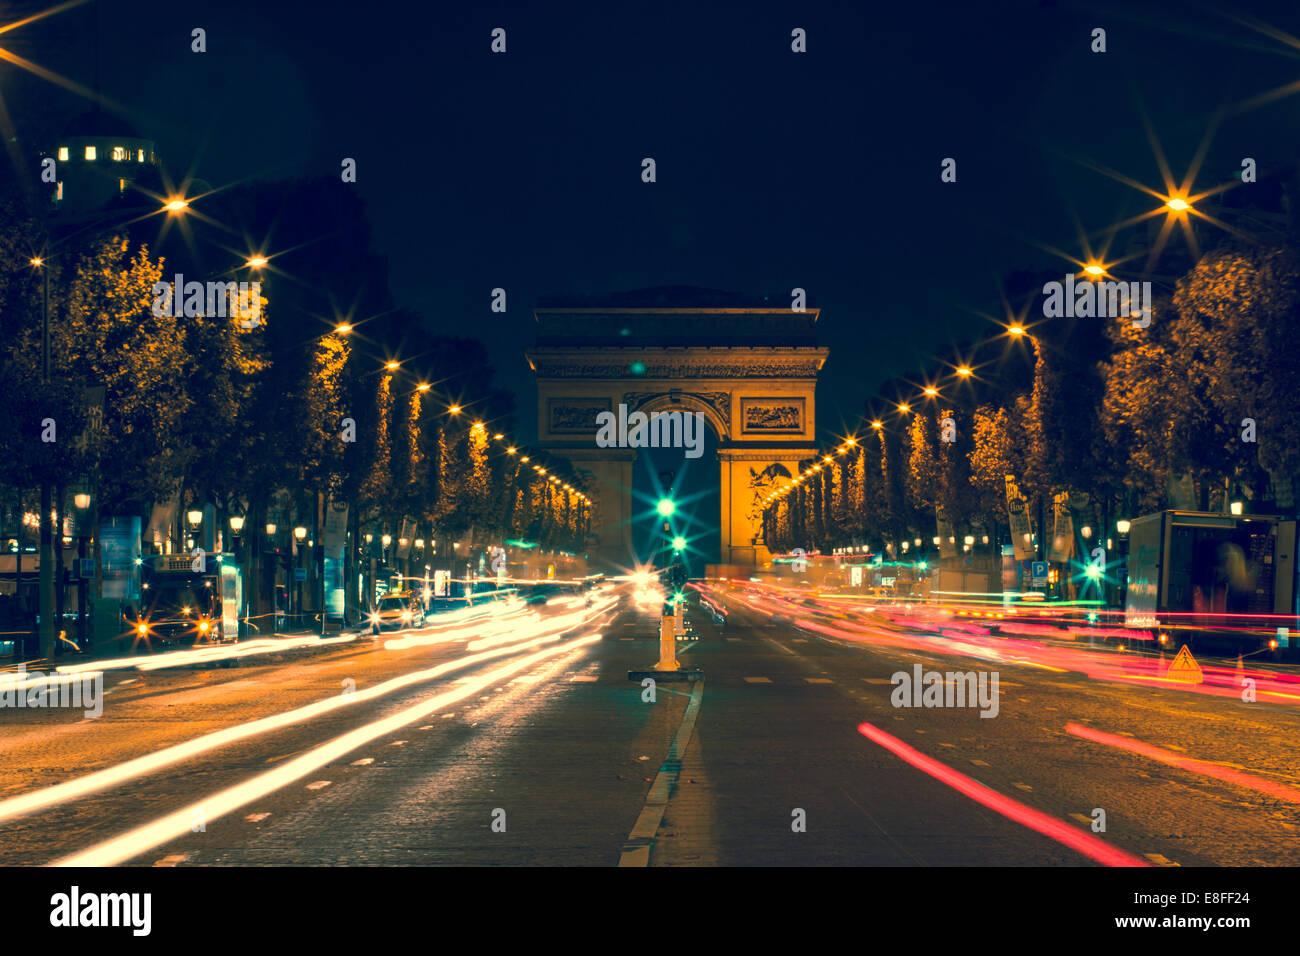 France, Paris, Avenue des Champs-Elyses at night - Stock Image